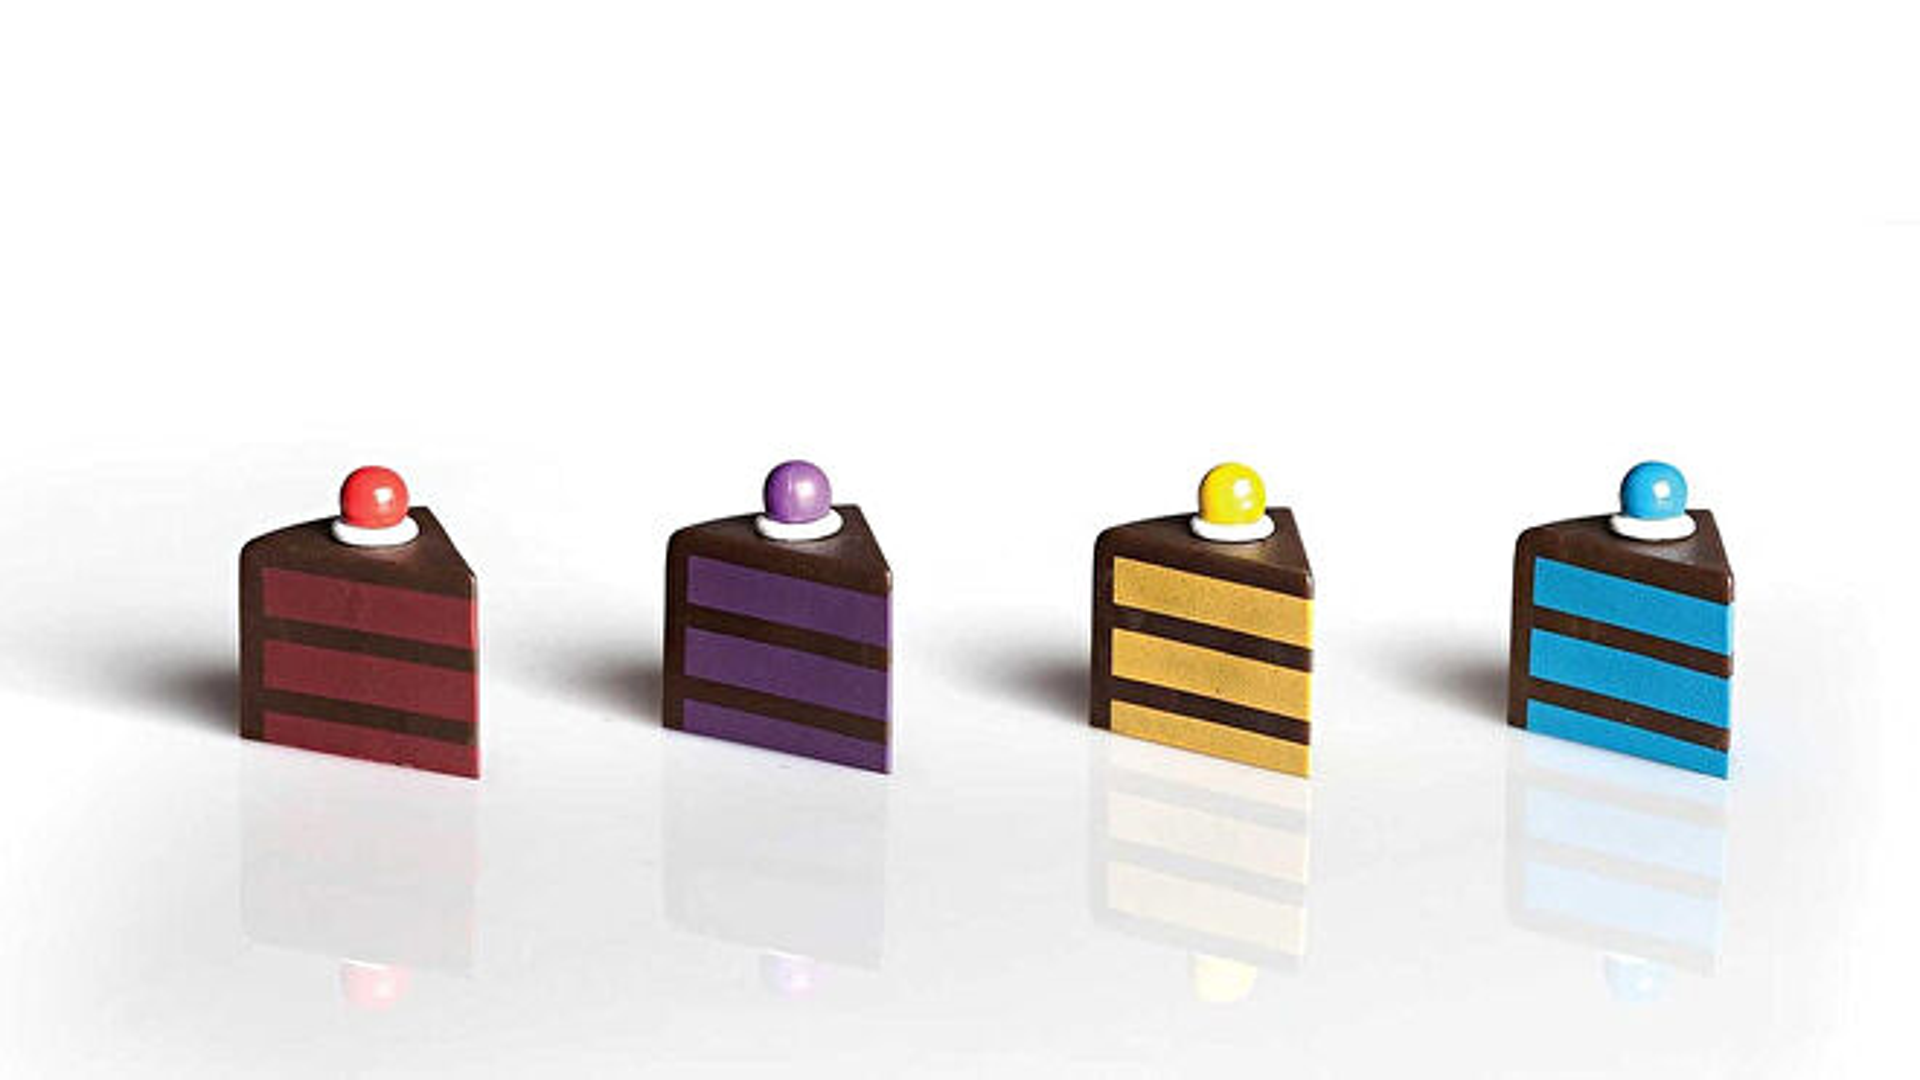 Portal: The Uncooperative Cake Acquisition Game pieces